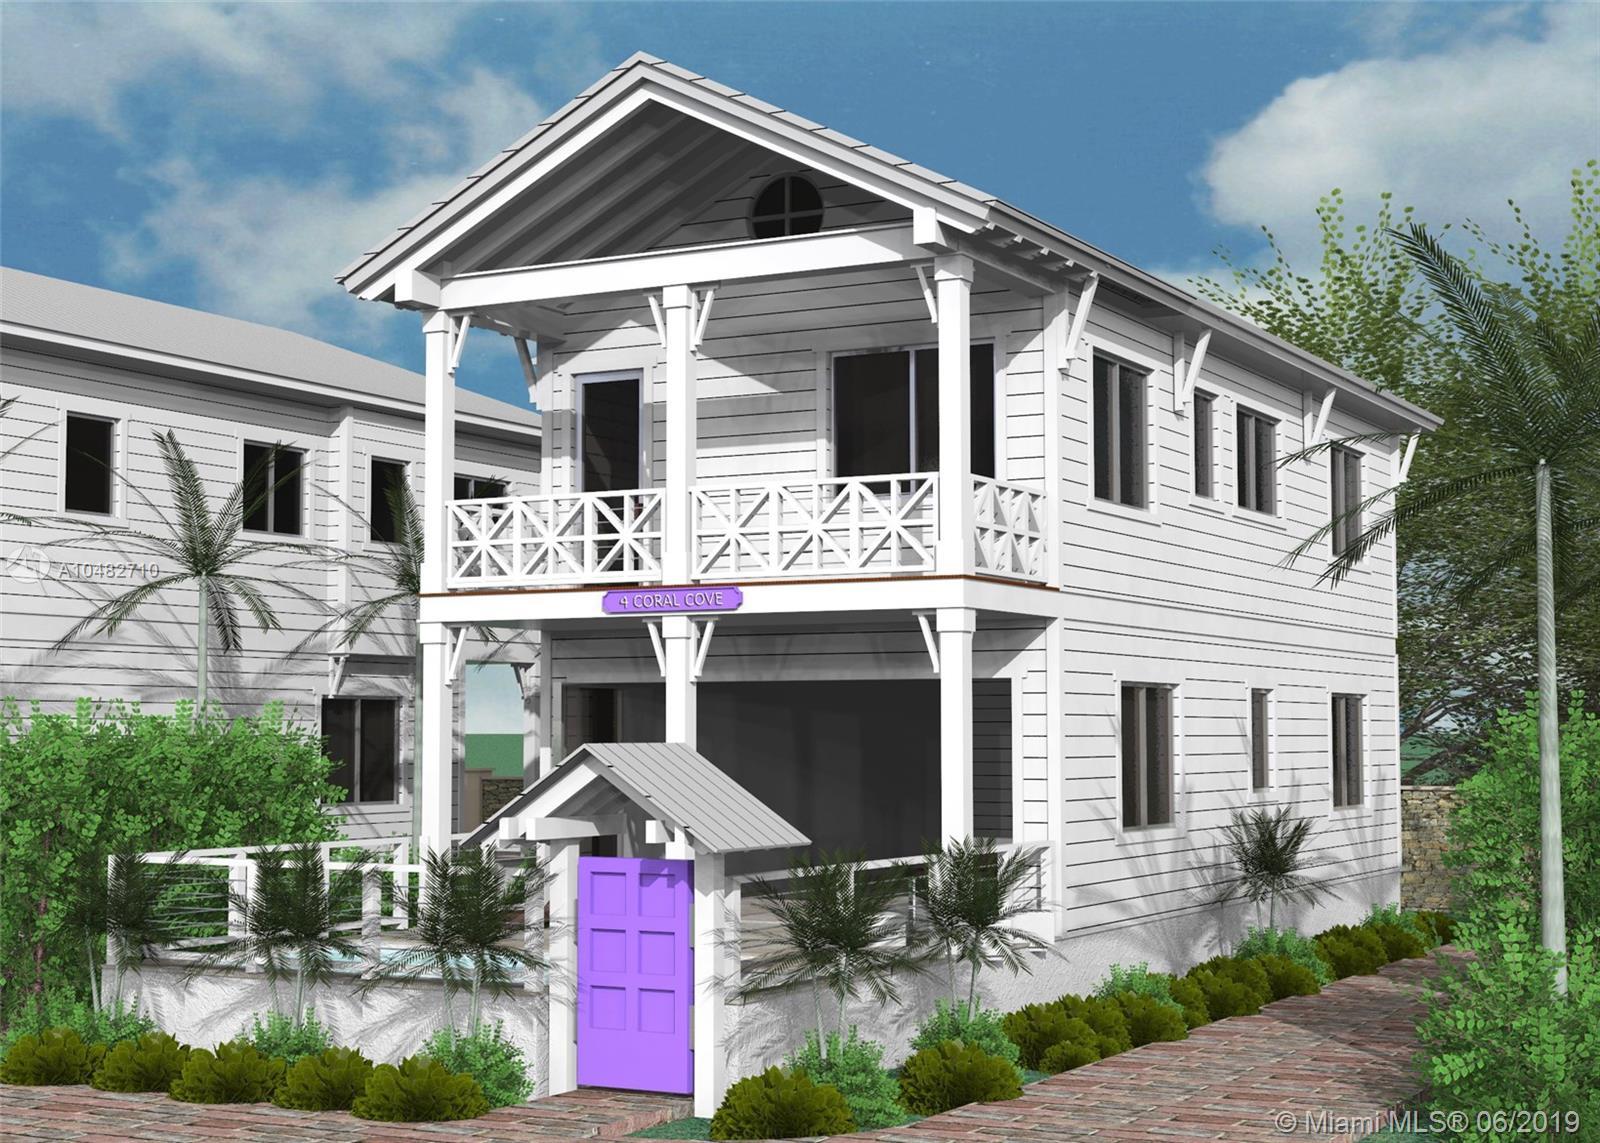 81906 #6 Overseas, Other City - Keys/Islands/Caribbean, FL 33036